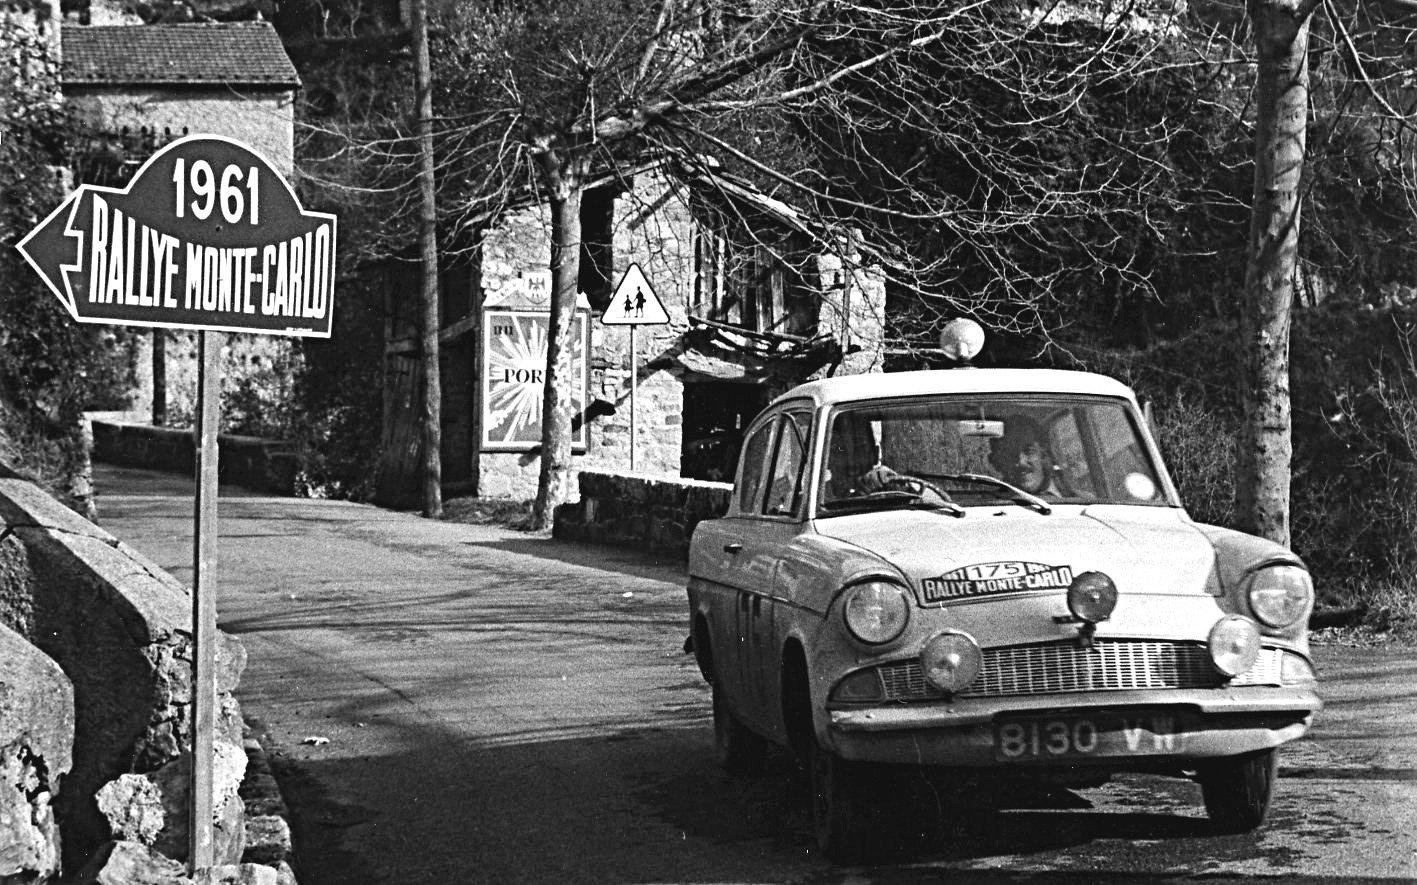 Ford Anglia at 1961 Monte-Carlo Rally - Rally Car Photo Print